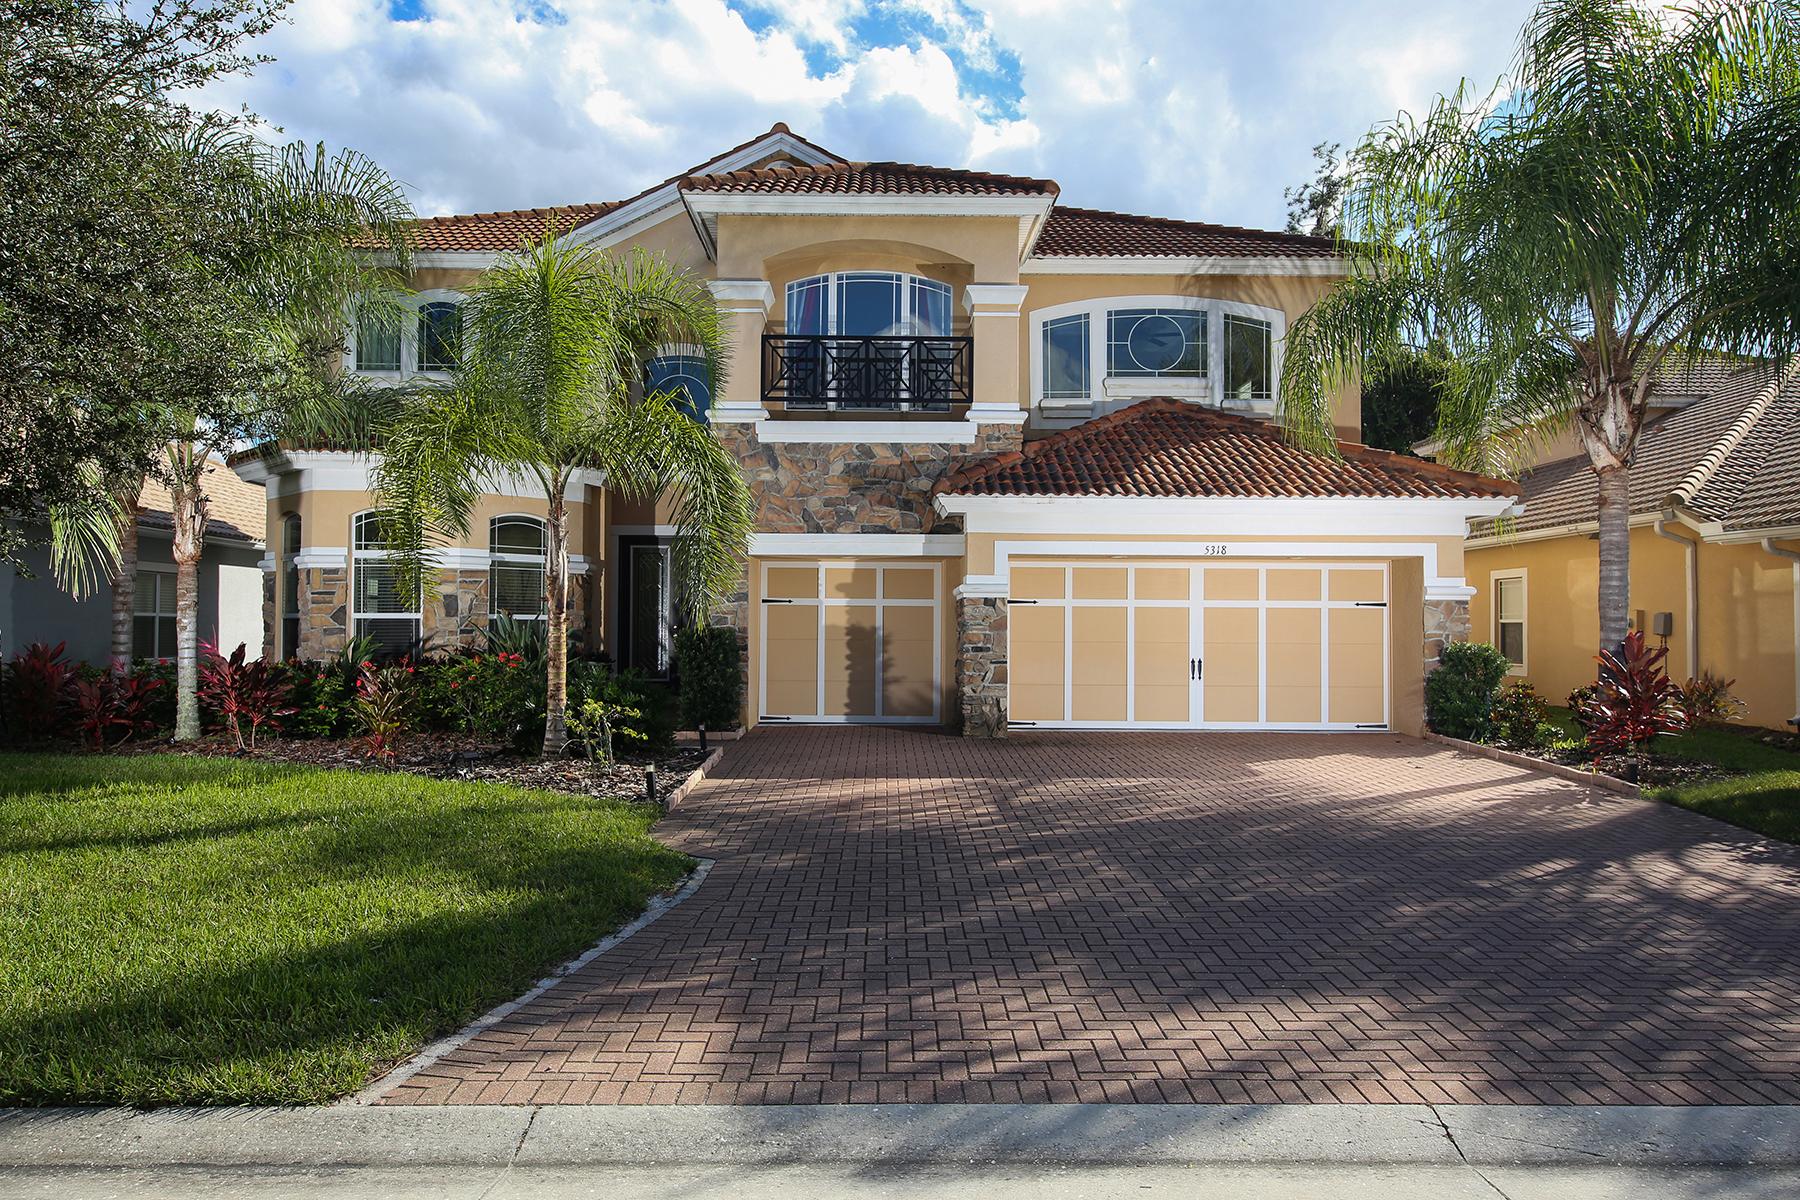 Single Family Home for Sale at SONOMA 5318 Napa Dr Sarasota, Florida, 34243 United States